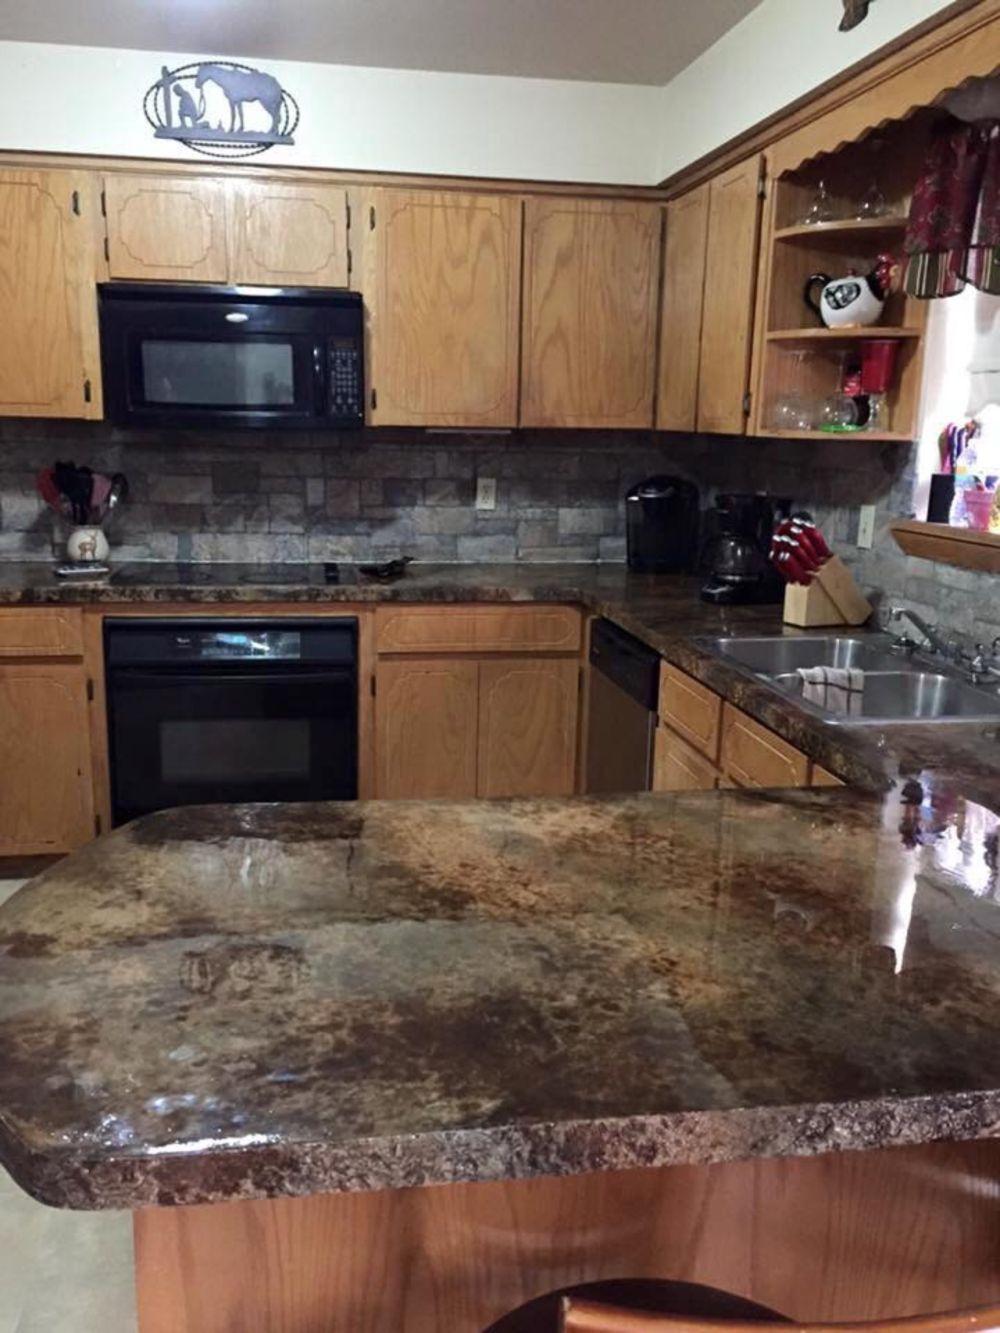 five epoxy best countertops smallspaces the kitchen about kits refinishing diy com countertop resurfacing via